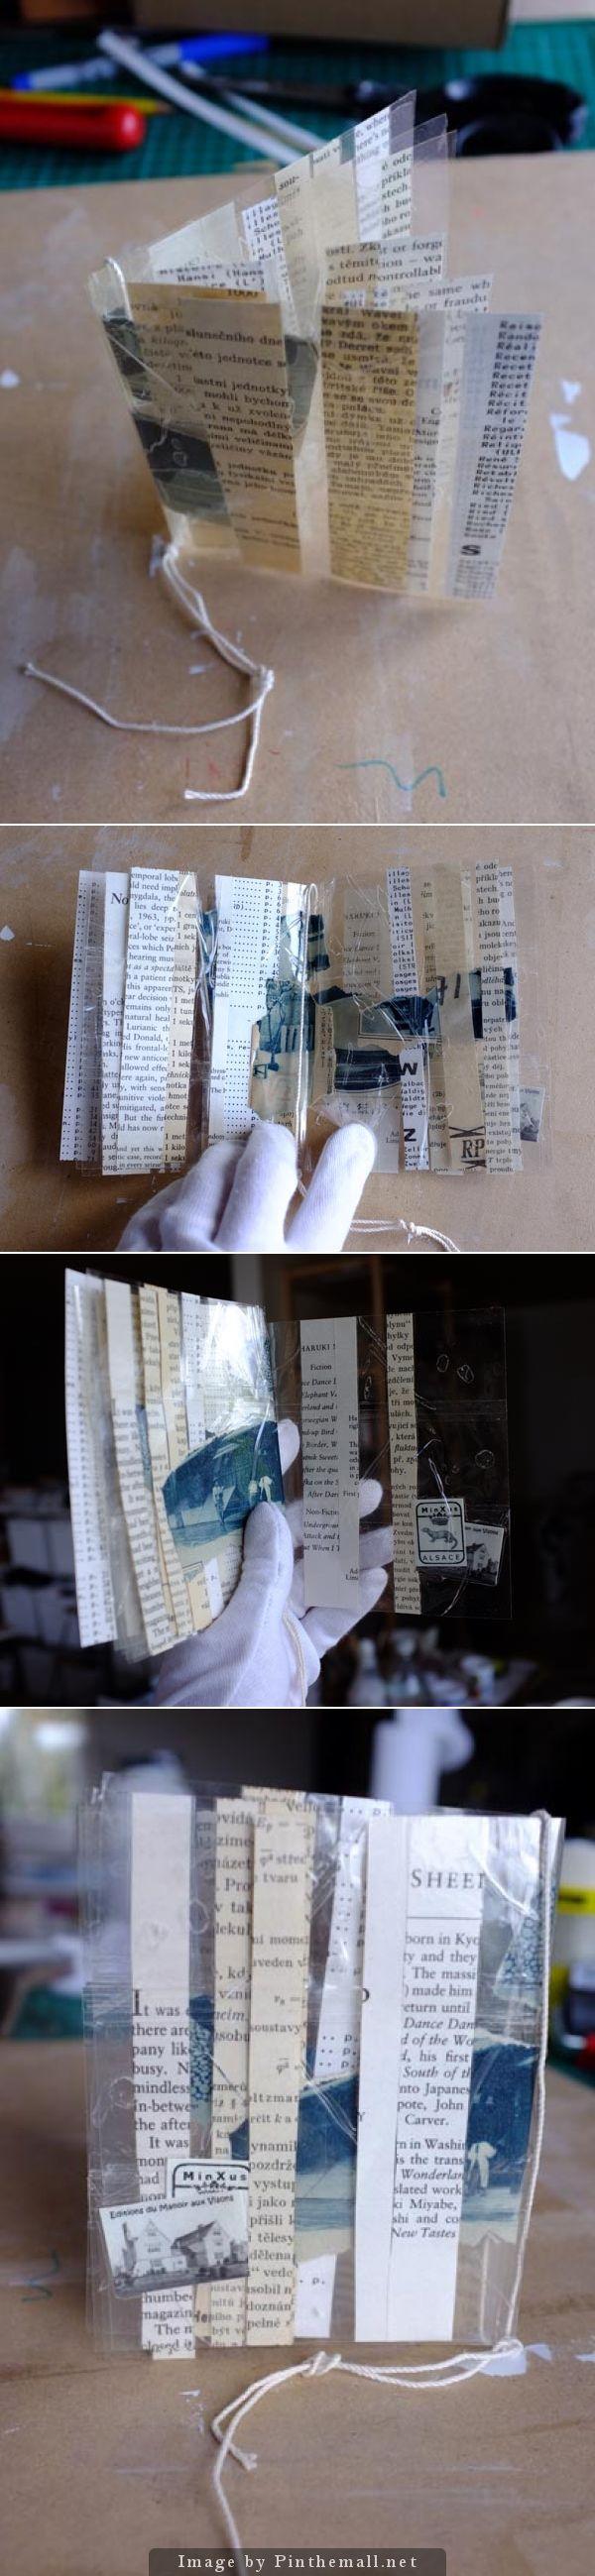 transparent-book-with-bubbles-marie-wintzer-japan